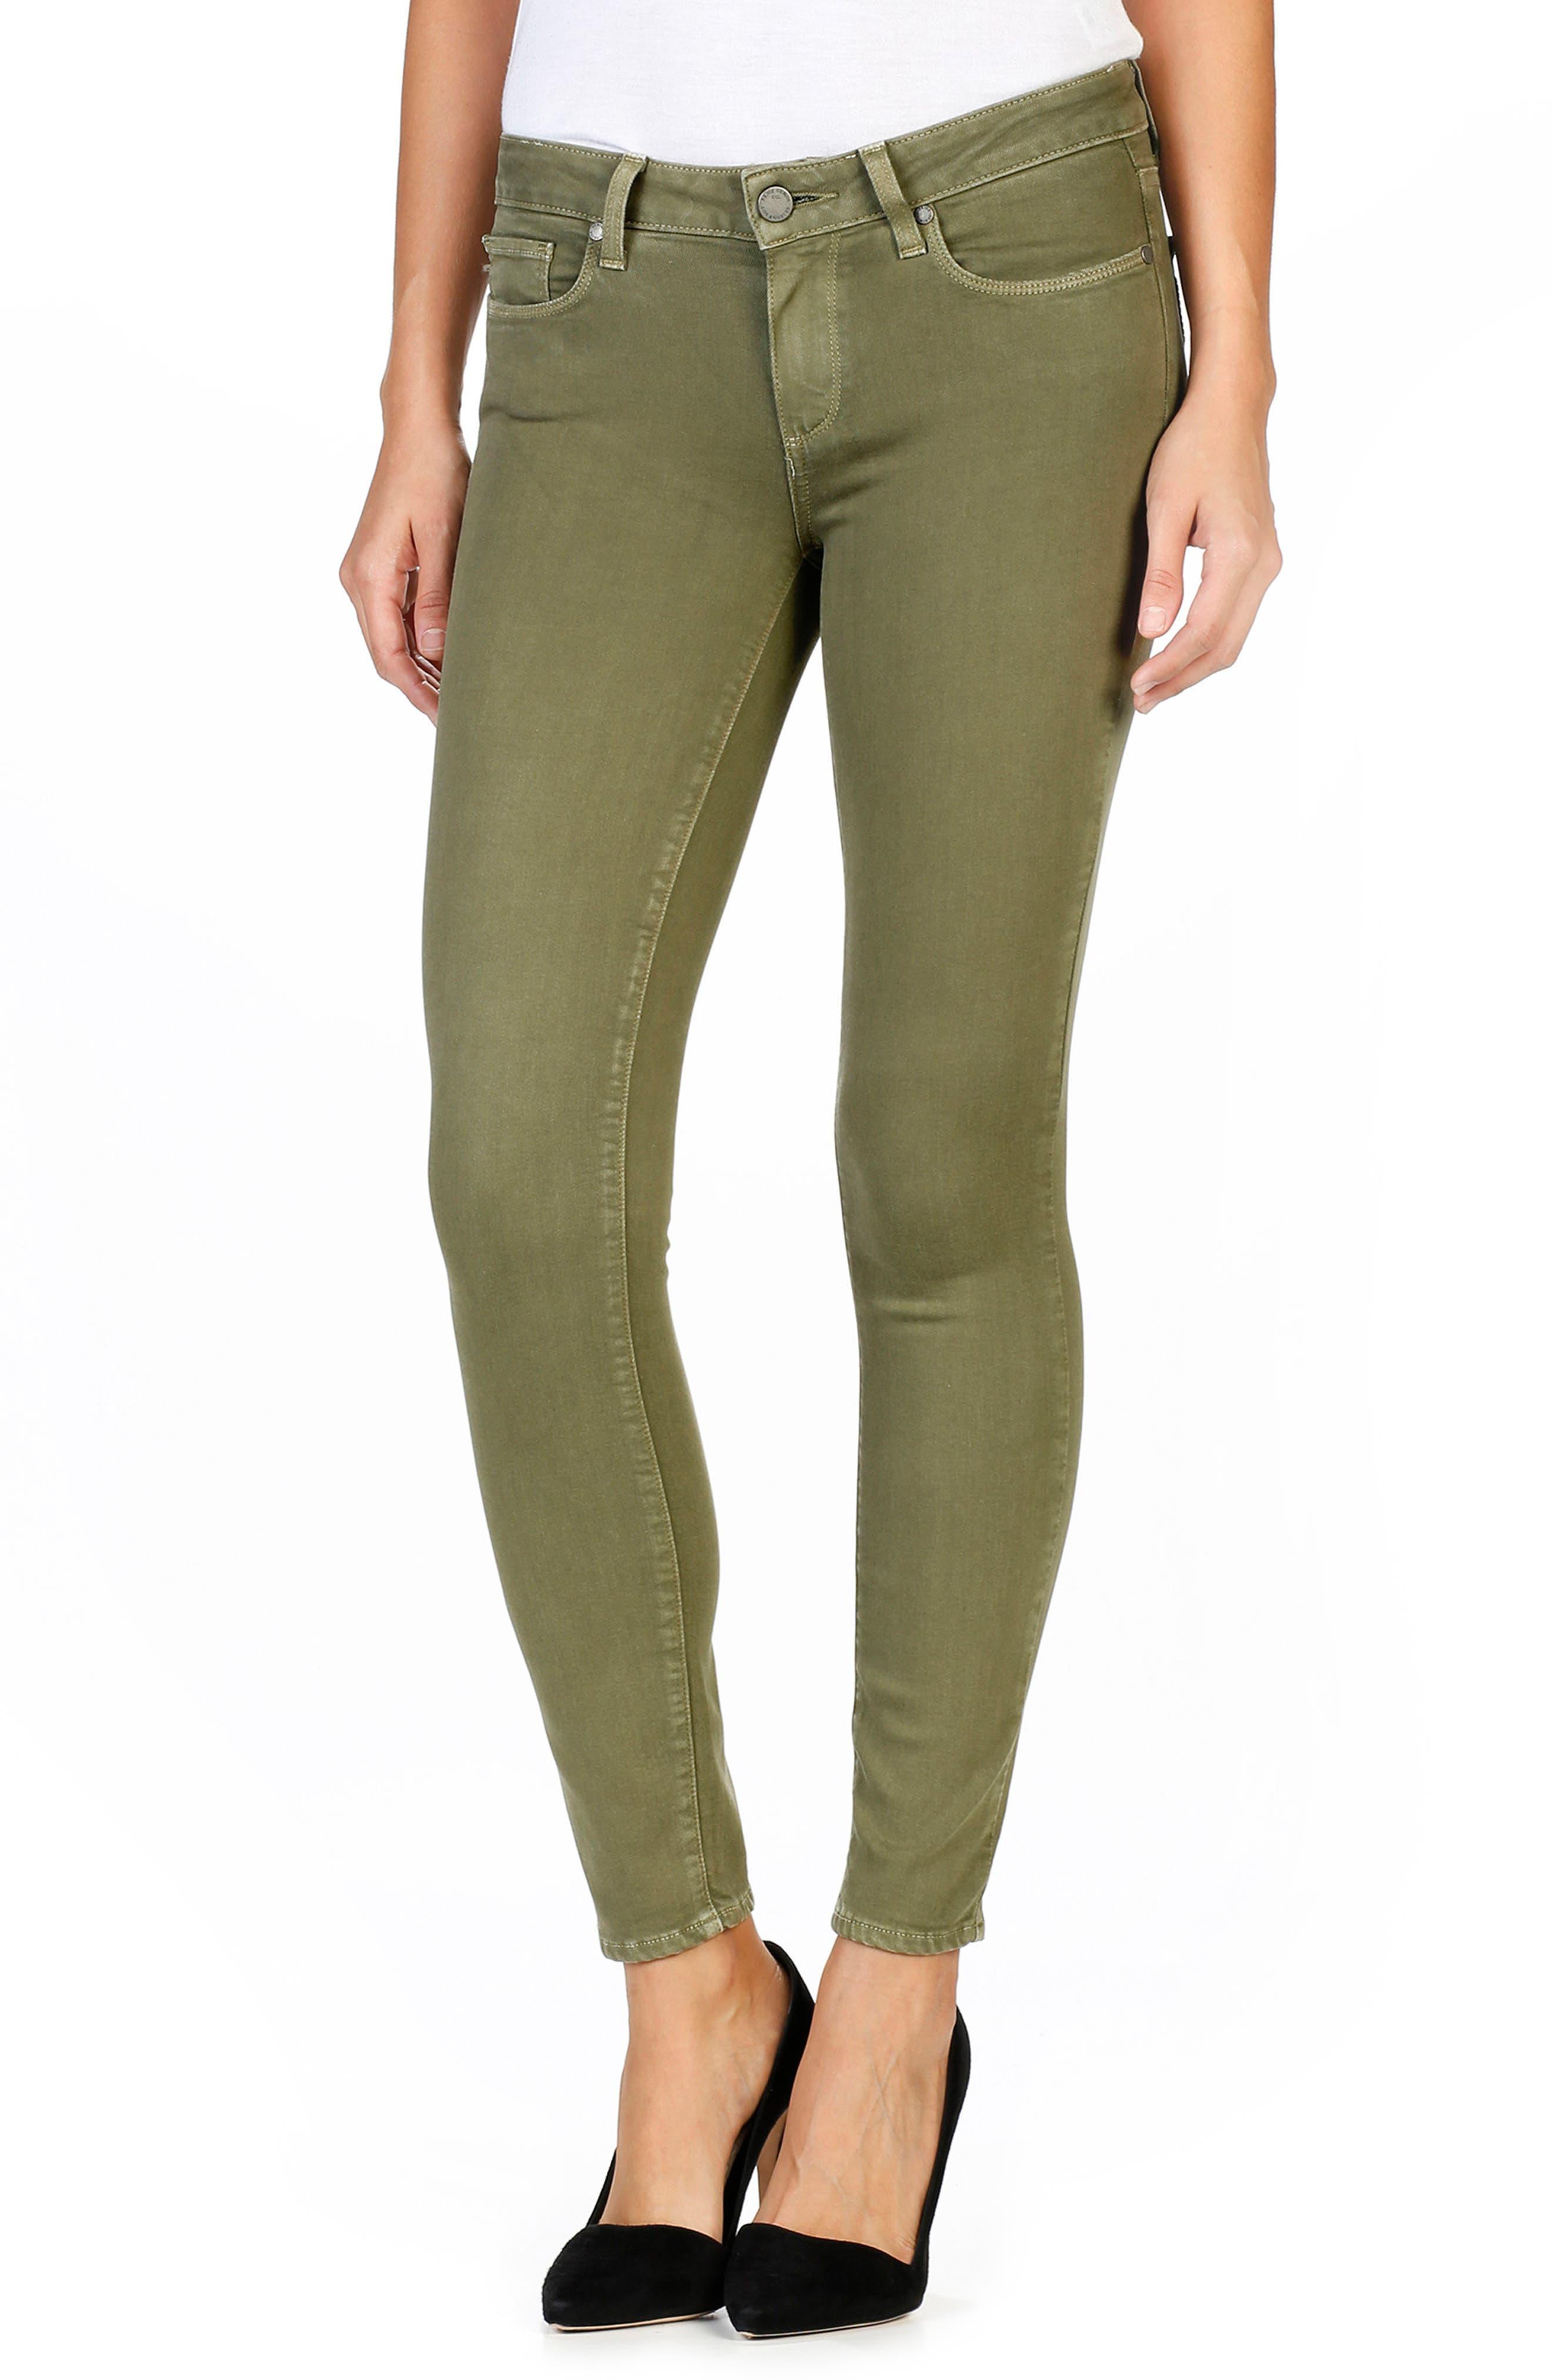 Main Image - PAIGE Transcend - Verdugo Ankle Skinny Jeans (Sahara Green)